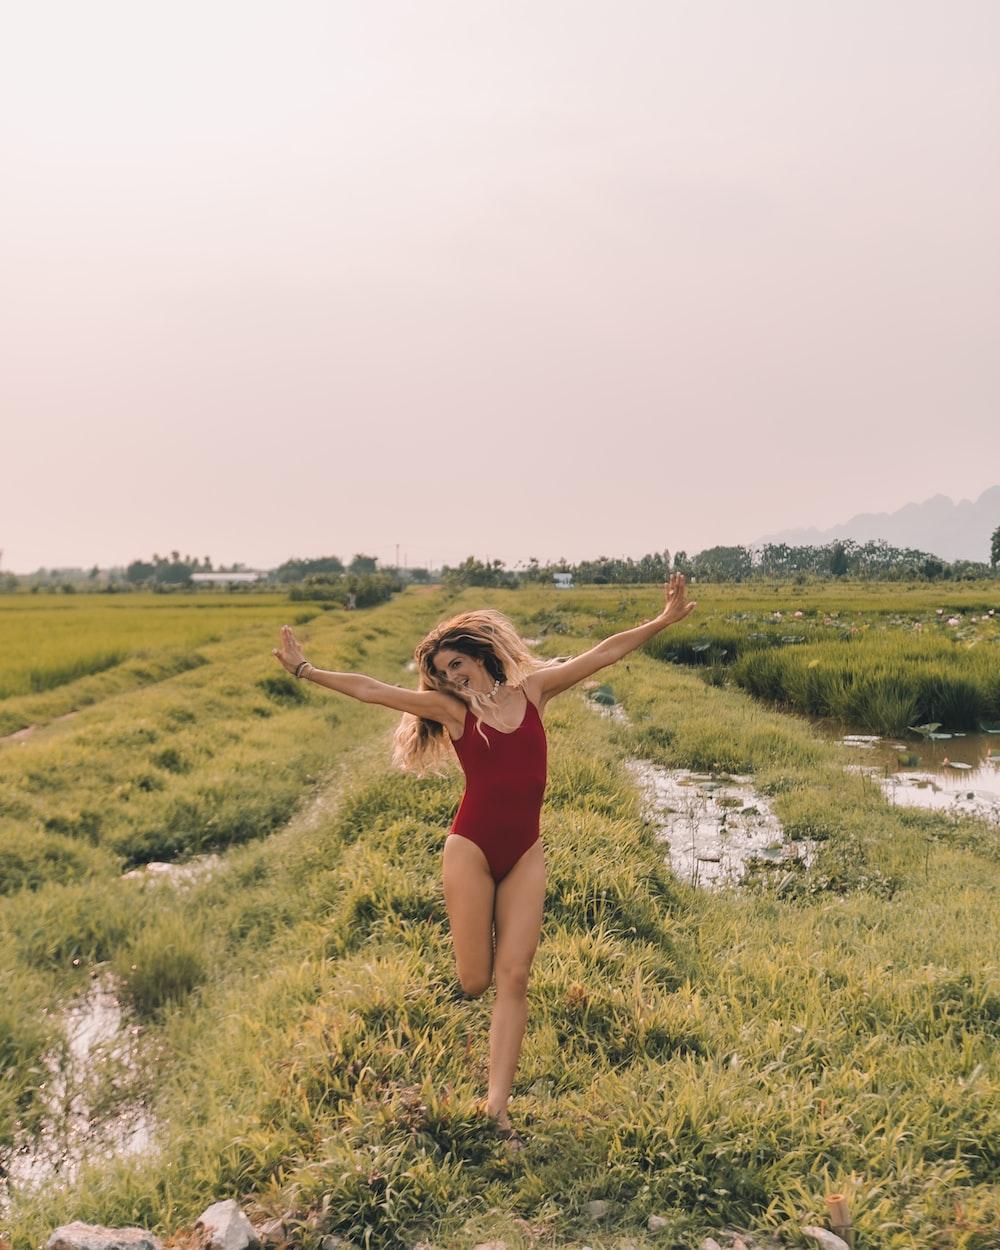 woman running in grass field wearing red swimsuit